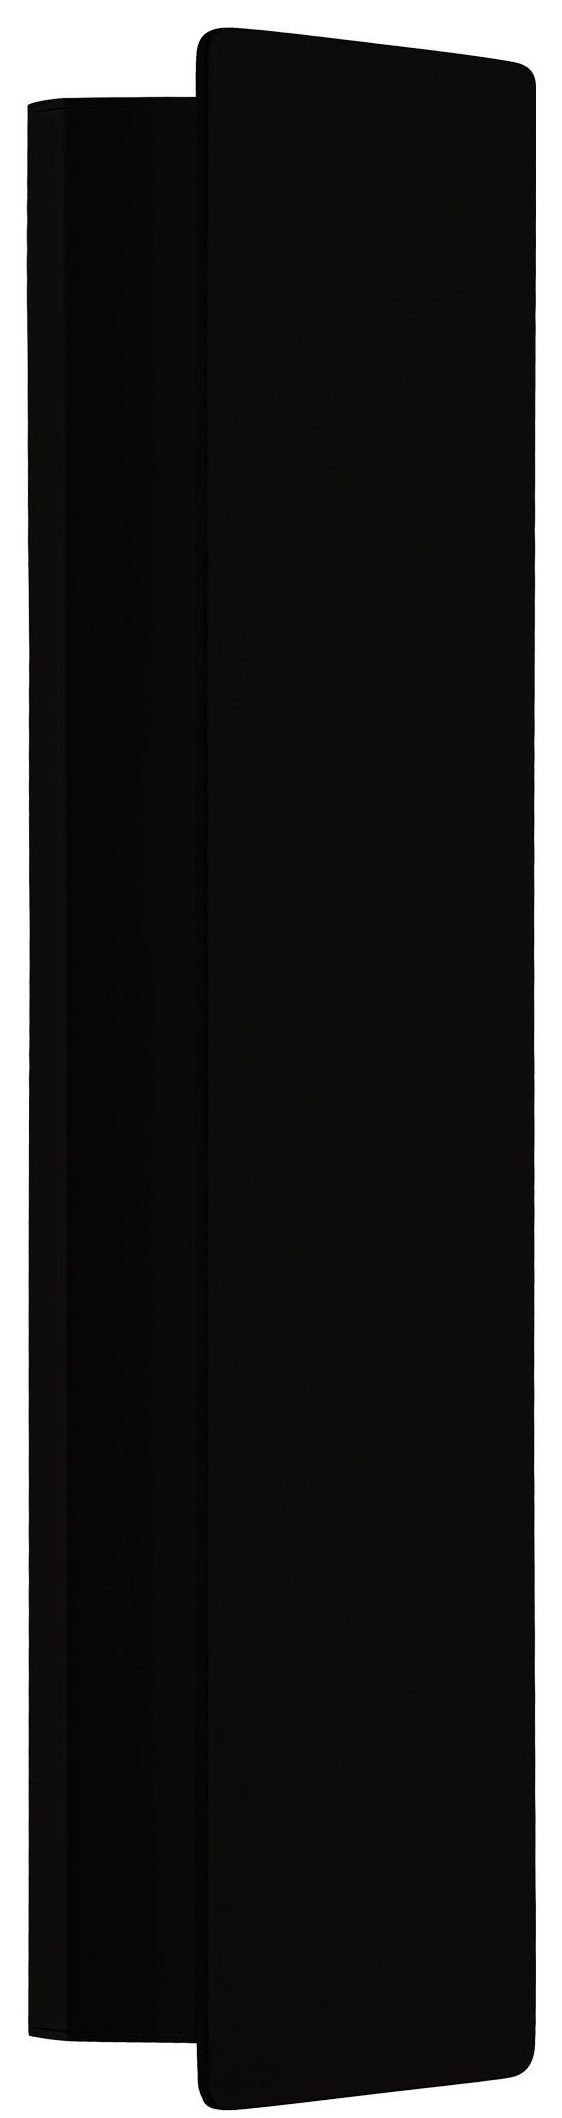 Led wandlamp zubialde 1400lm l360 zwart - zwart - wit Eglo Wandlamp 99087-EGLO